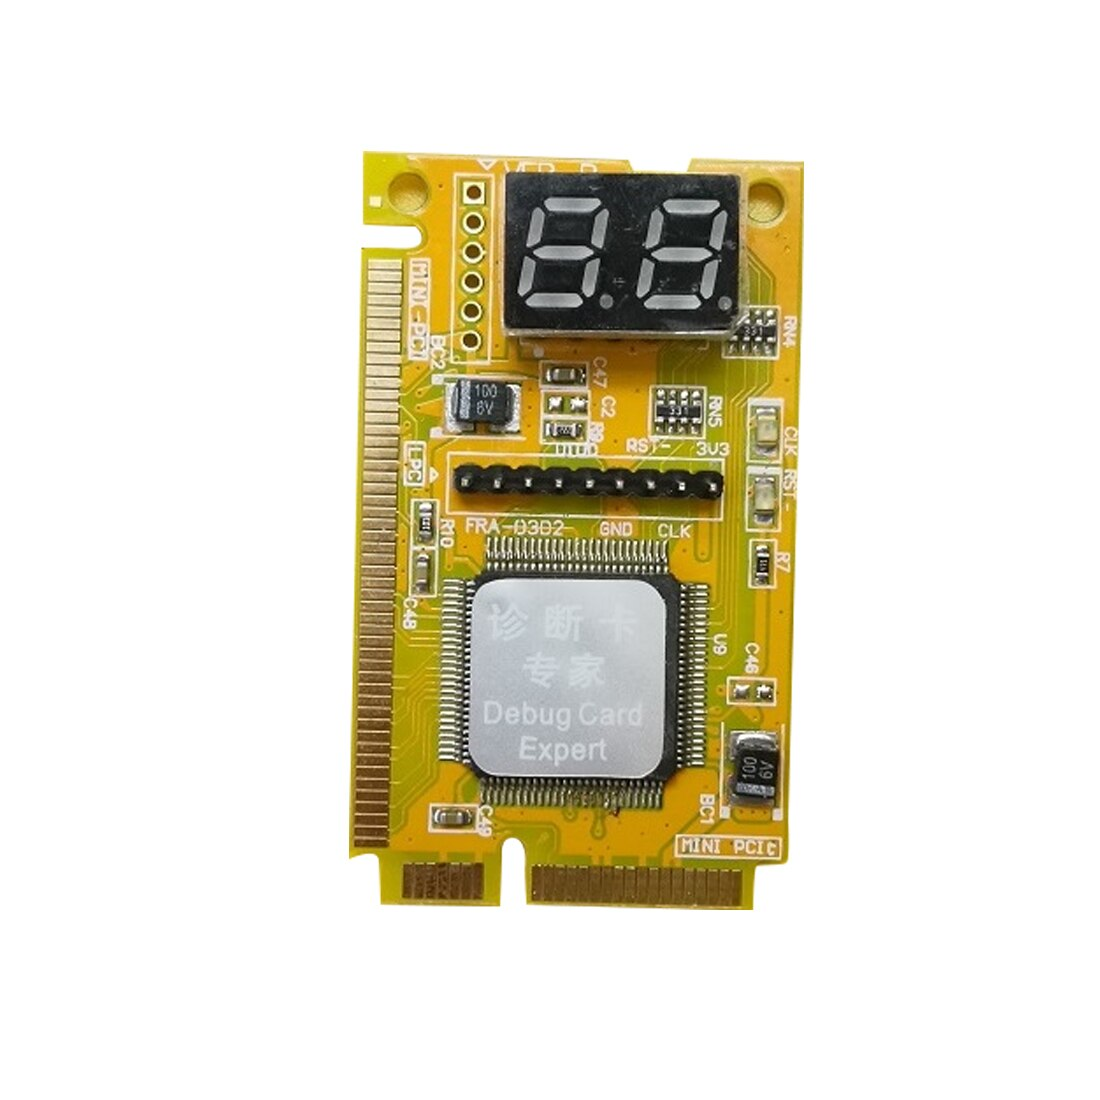 NOYOKERE Brand New Diagnostic Post Card USB Mini PCI E PCI LPC Analyzer Tester for Laptop Notebook High Quality